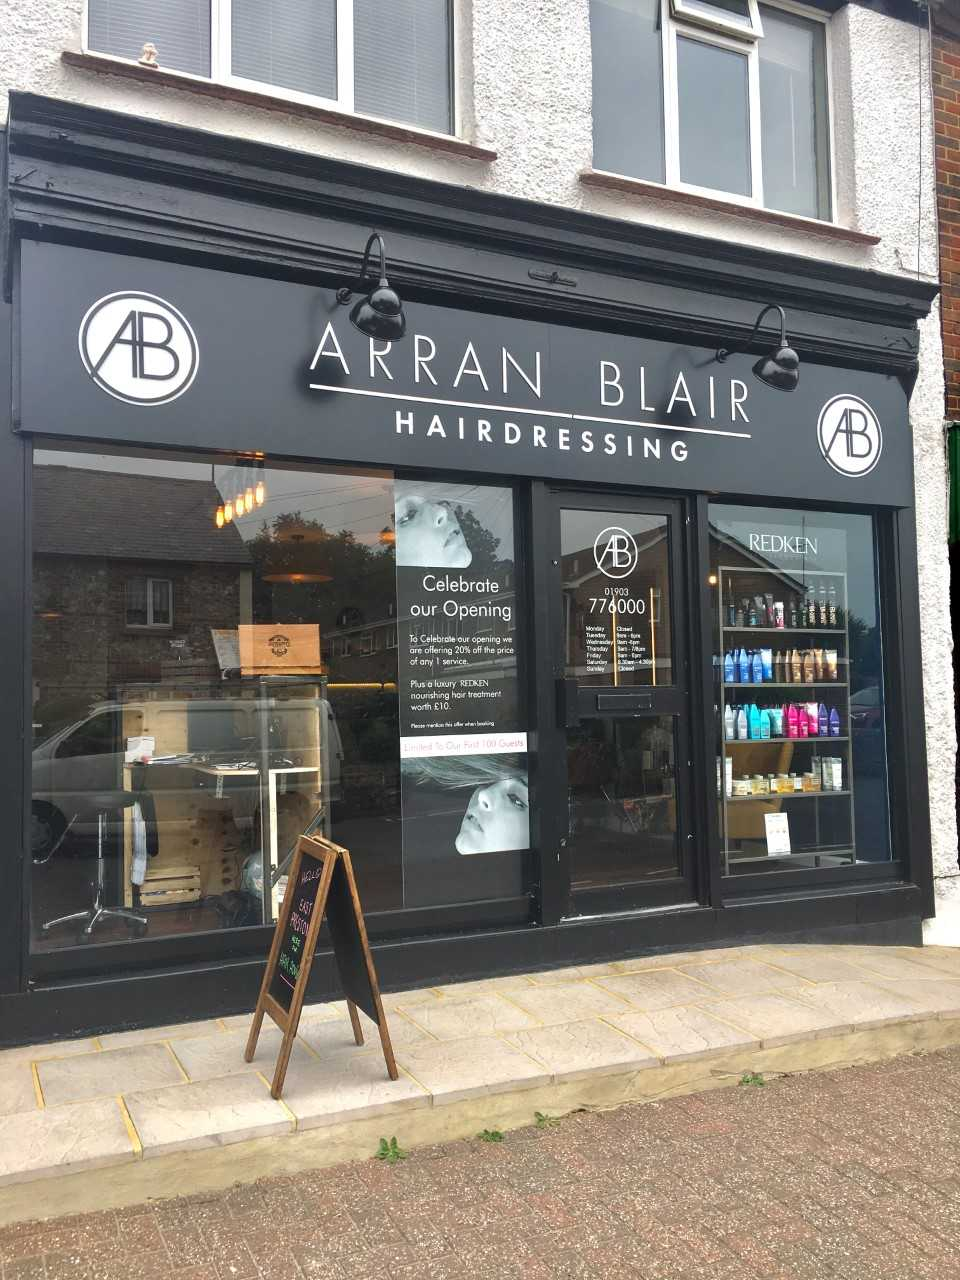 Arran Blair in East Preston (1)